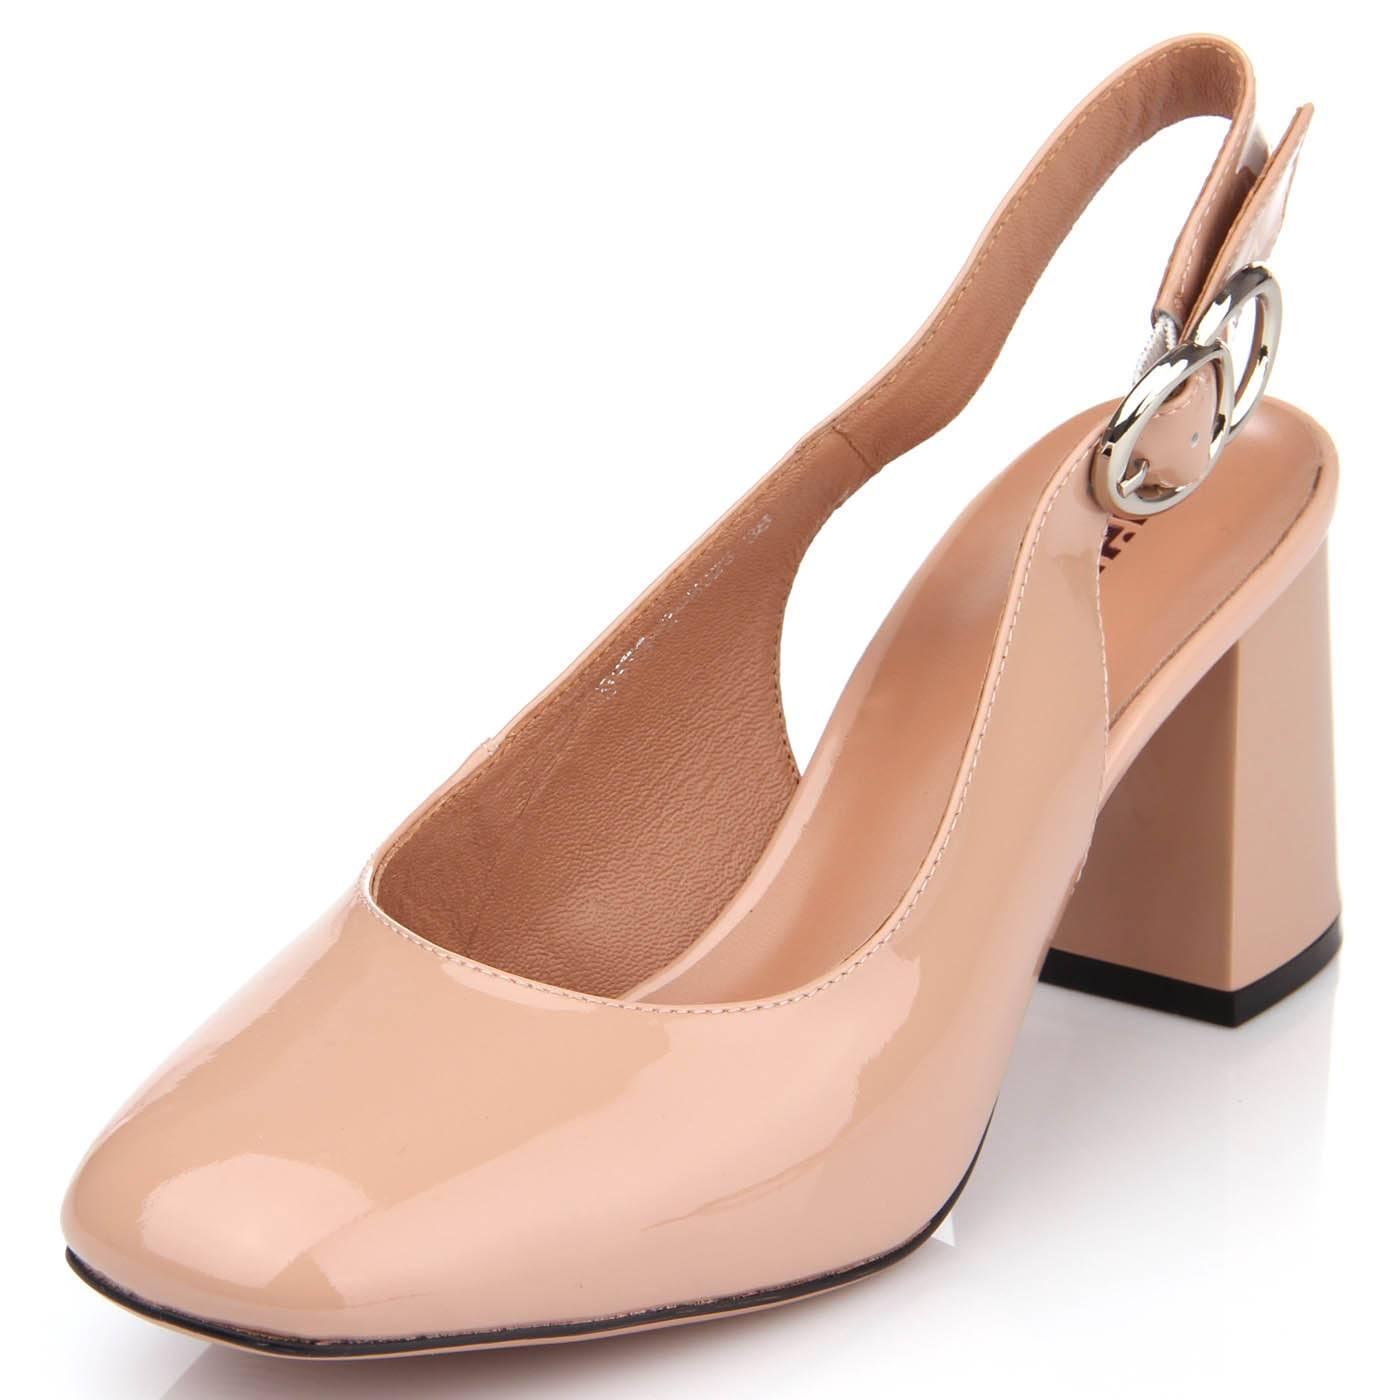 Туфлі жіночі ditto 6455 Бежевий купить по выгодной цене в интернет ... 98be43fe5a516